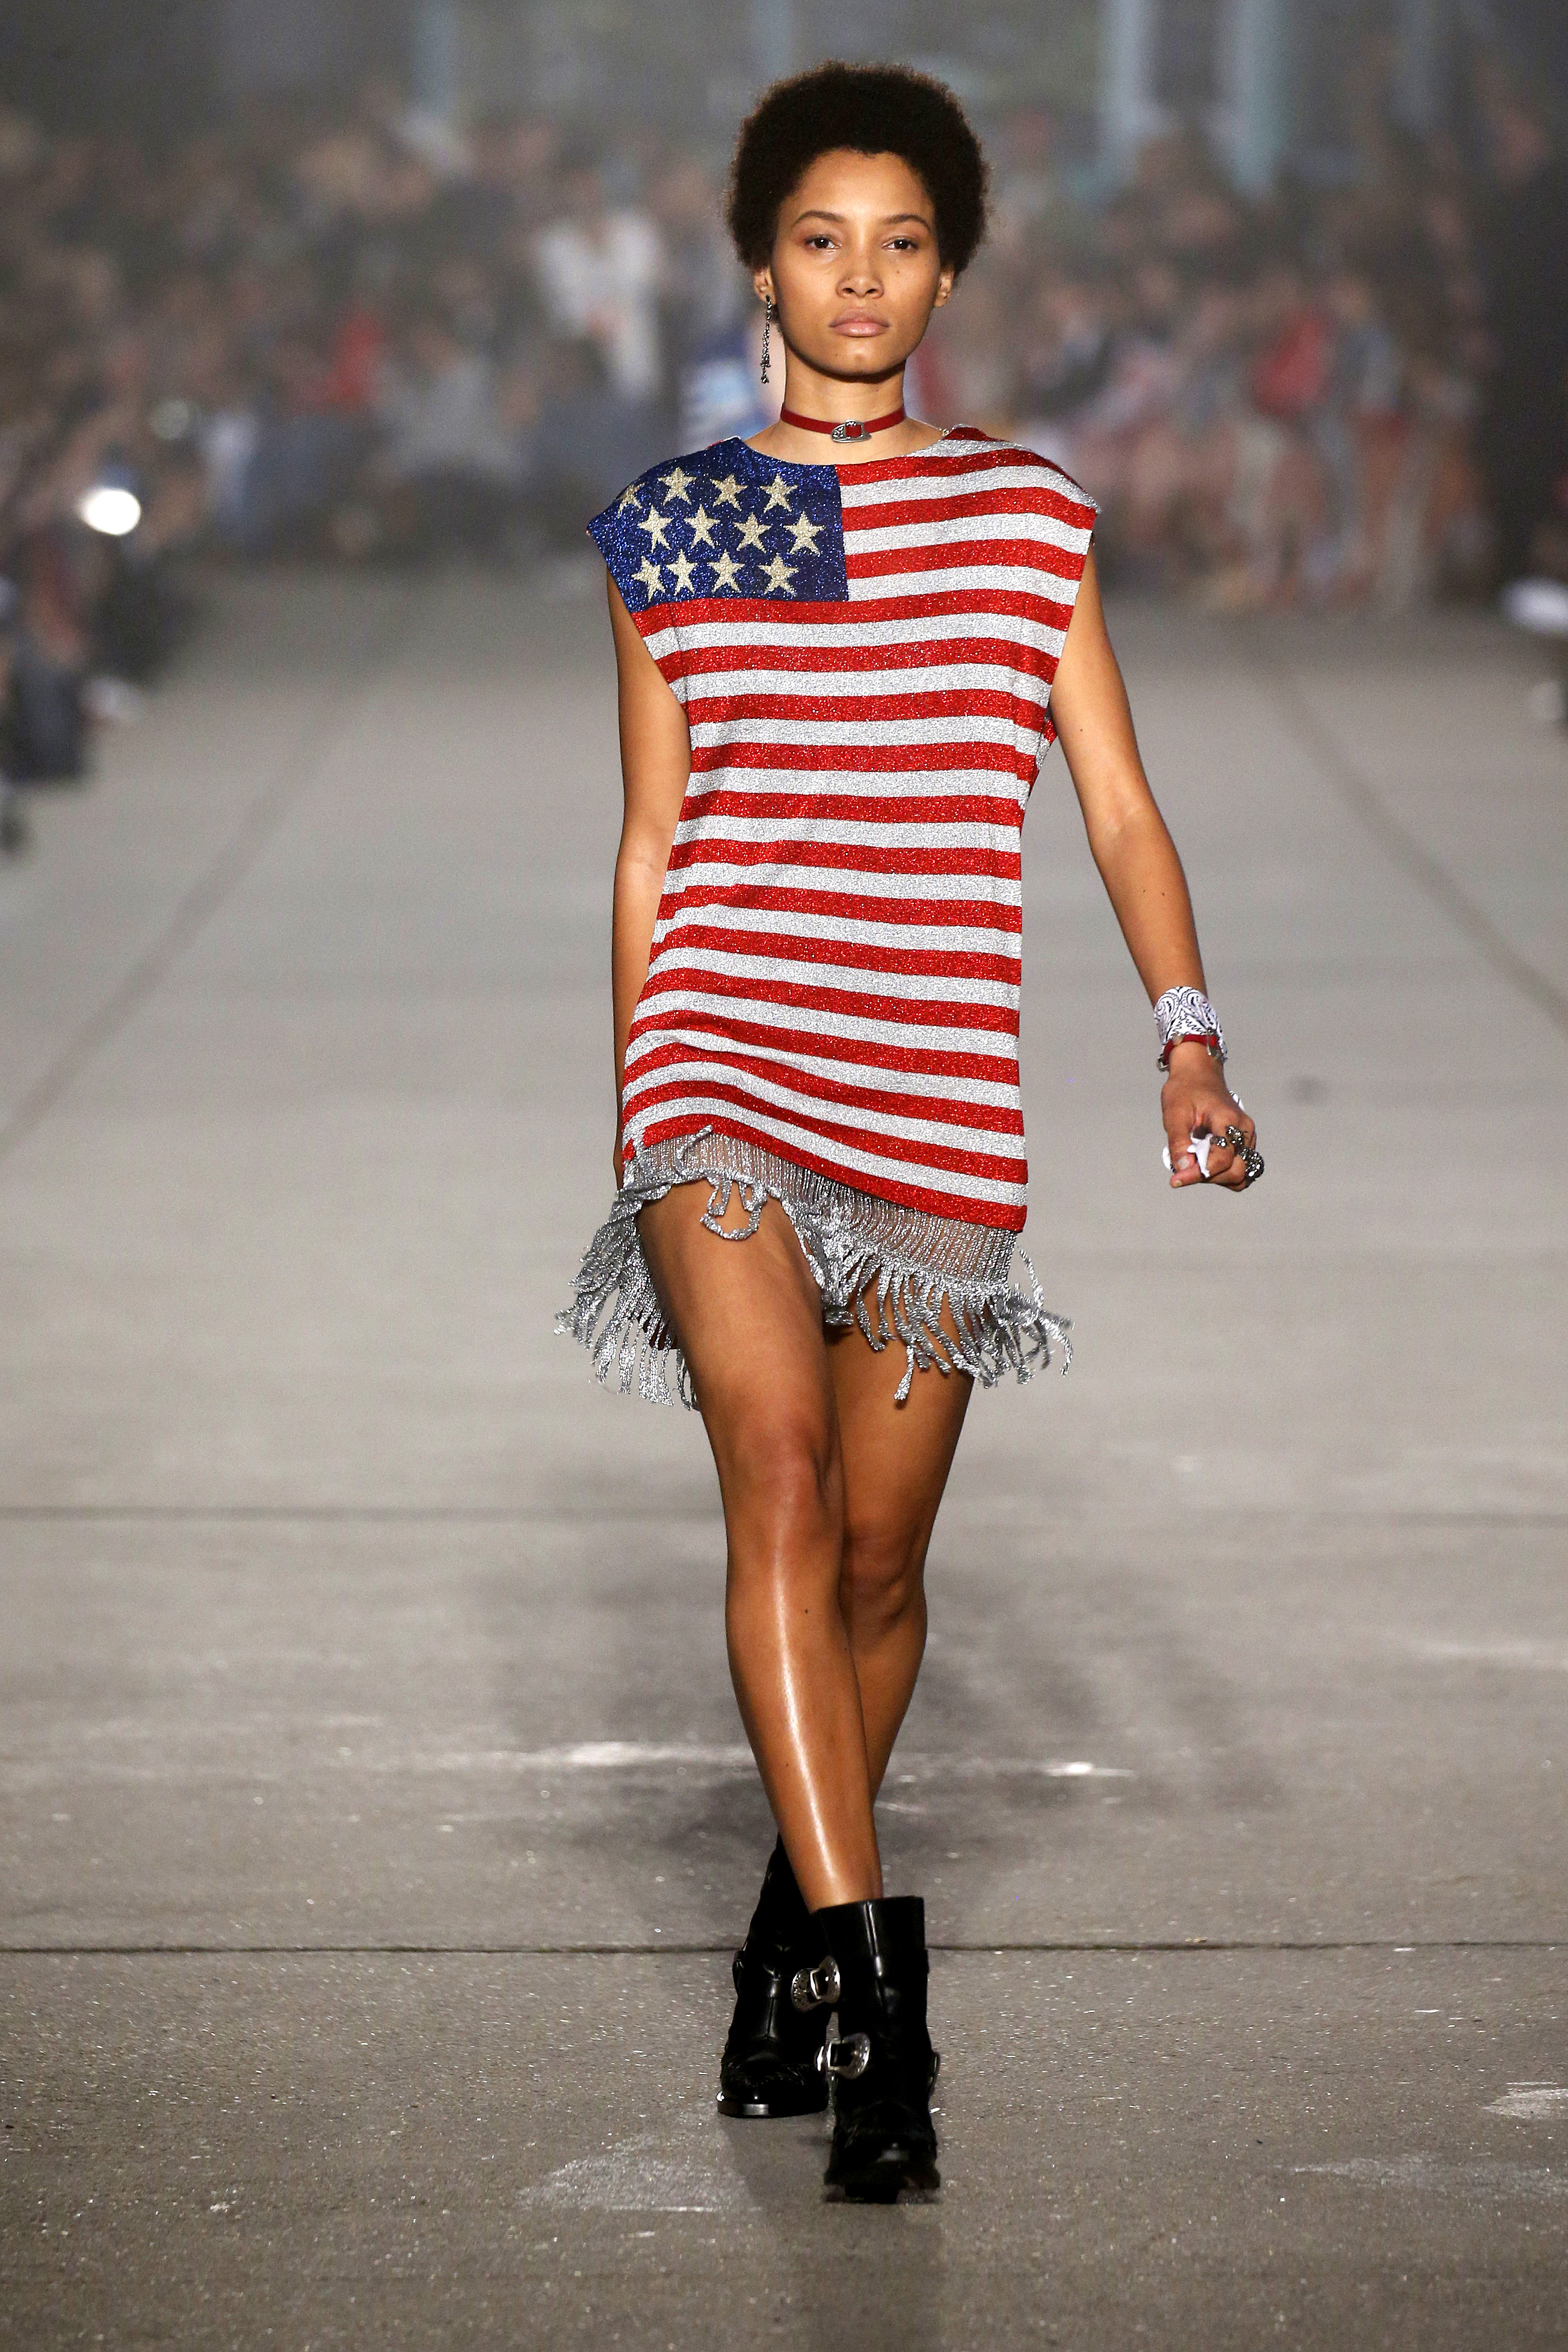 Spanish Fashion: Ladies Edition - Young Adventuress 85